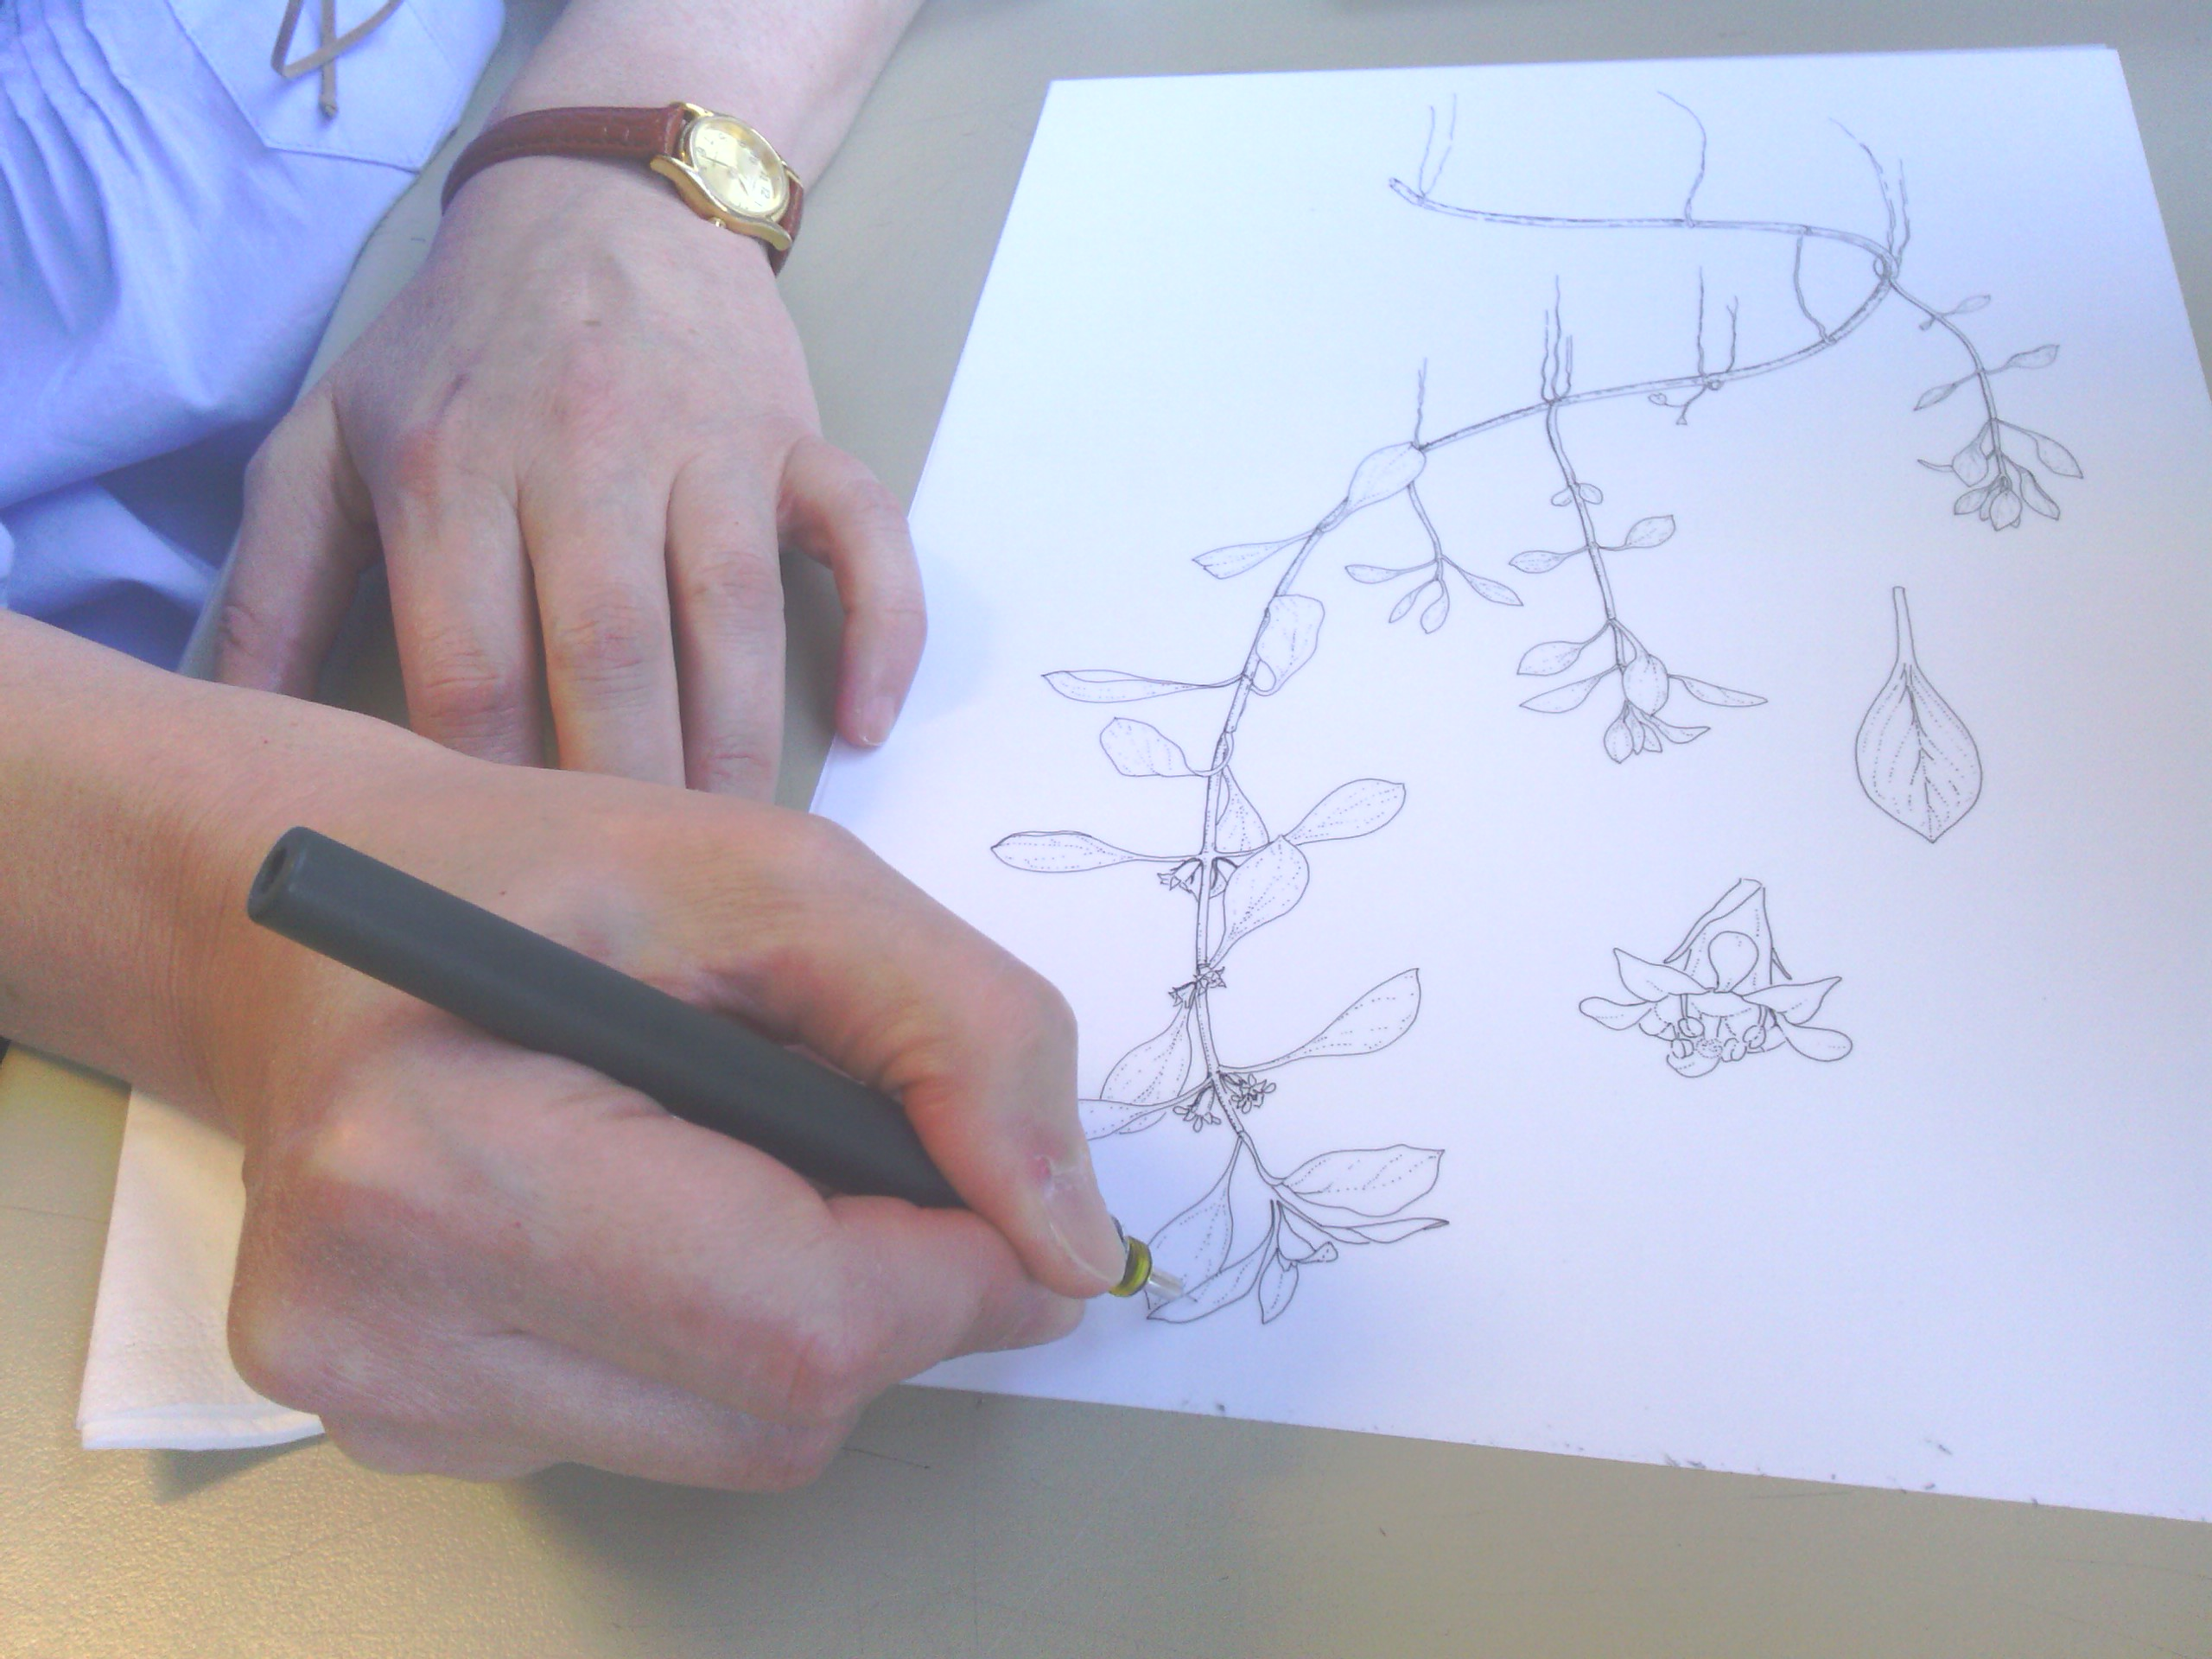 Marta Chirino dibujando en el Real Jardín Botánico, Madrid